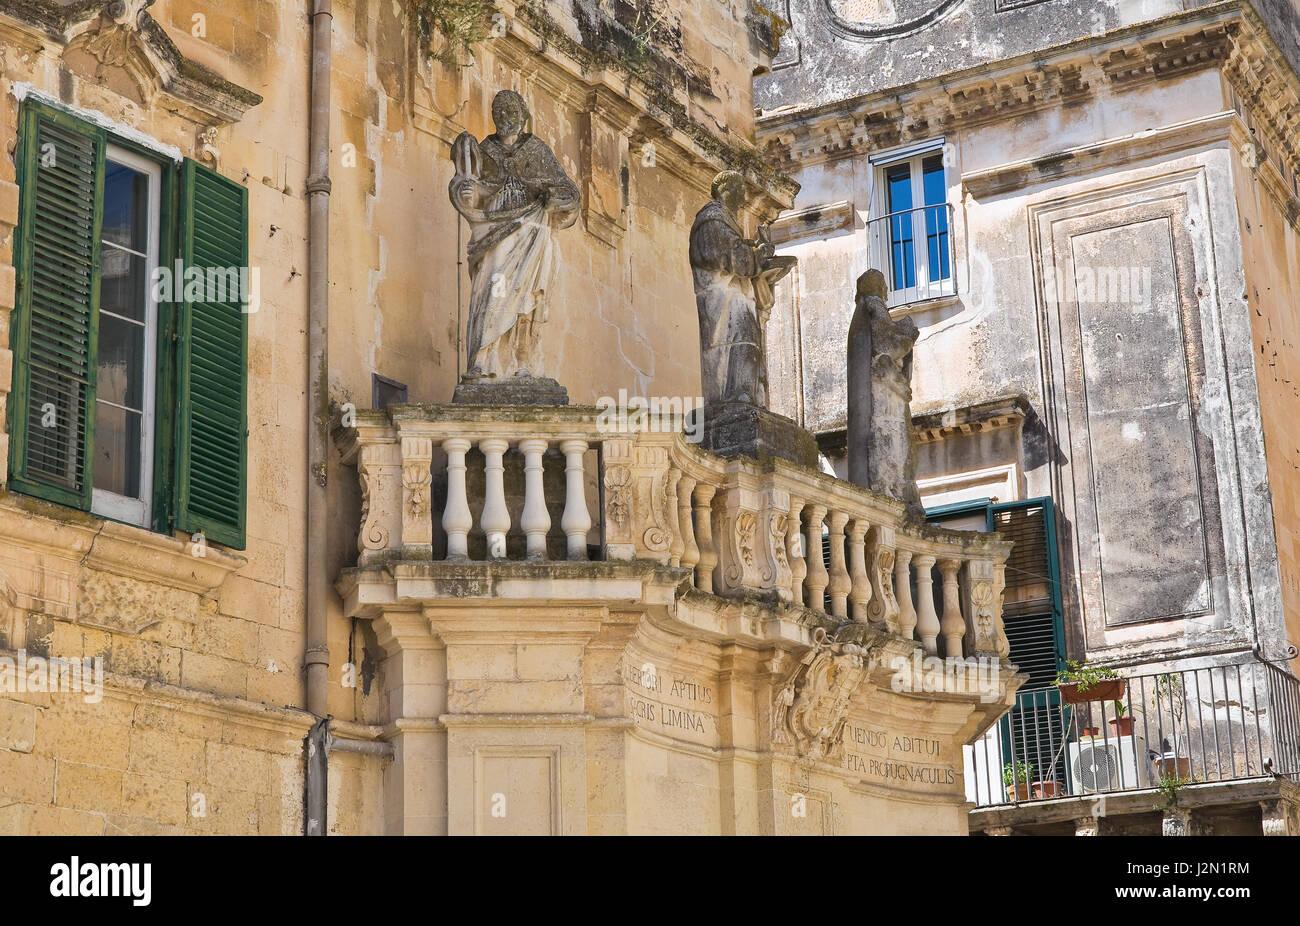 Propylaea. Lecce. Puglia. Italy. - Stock Image